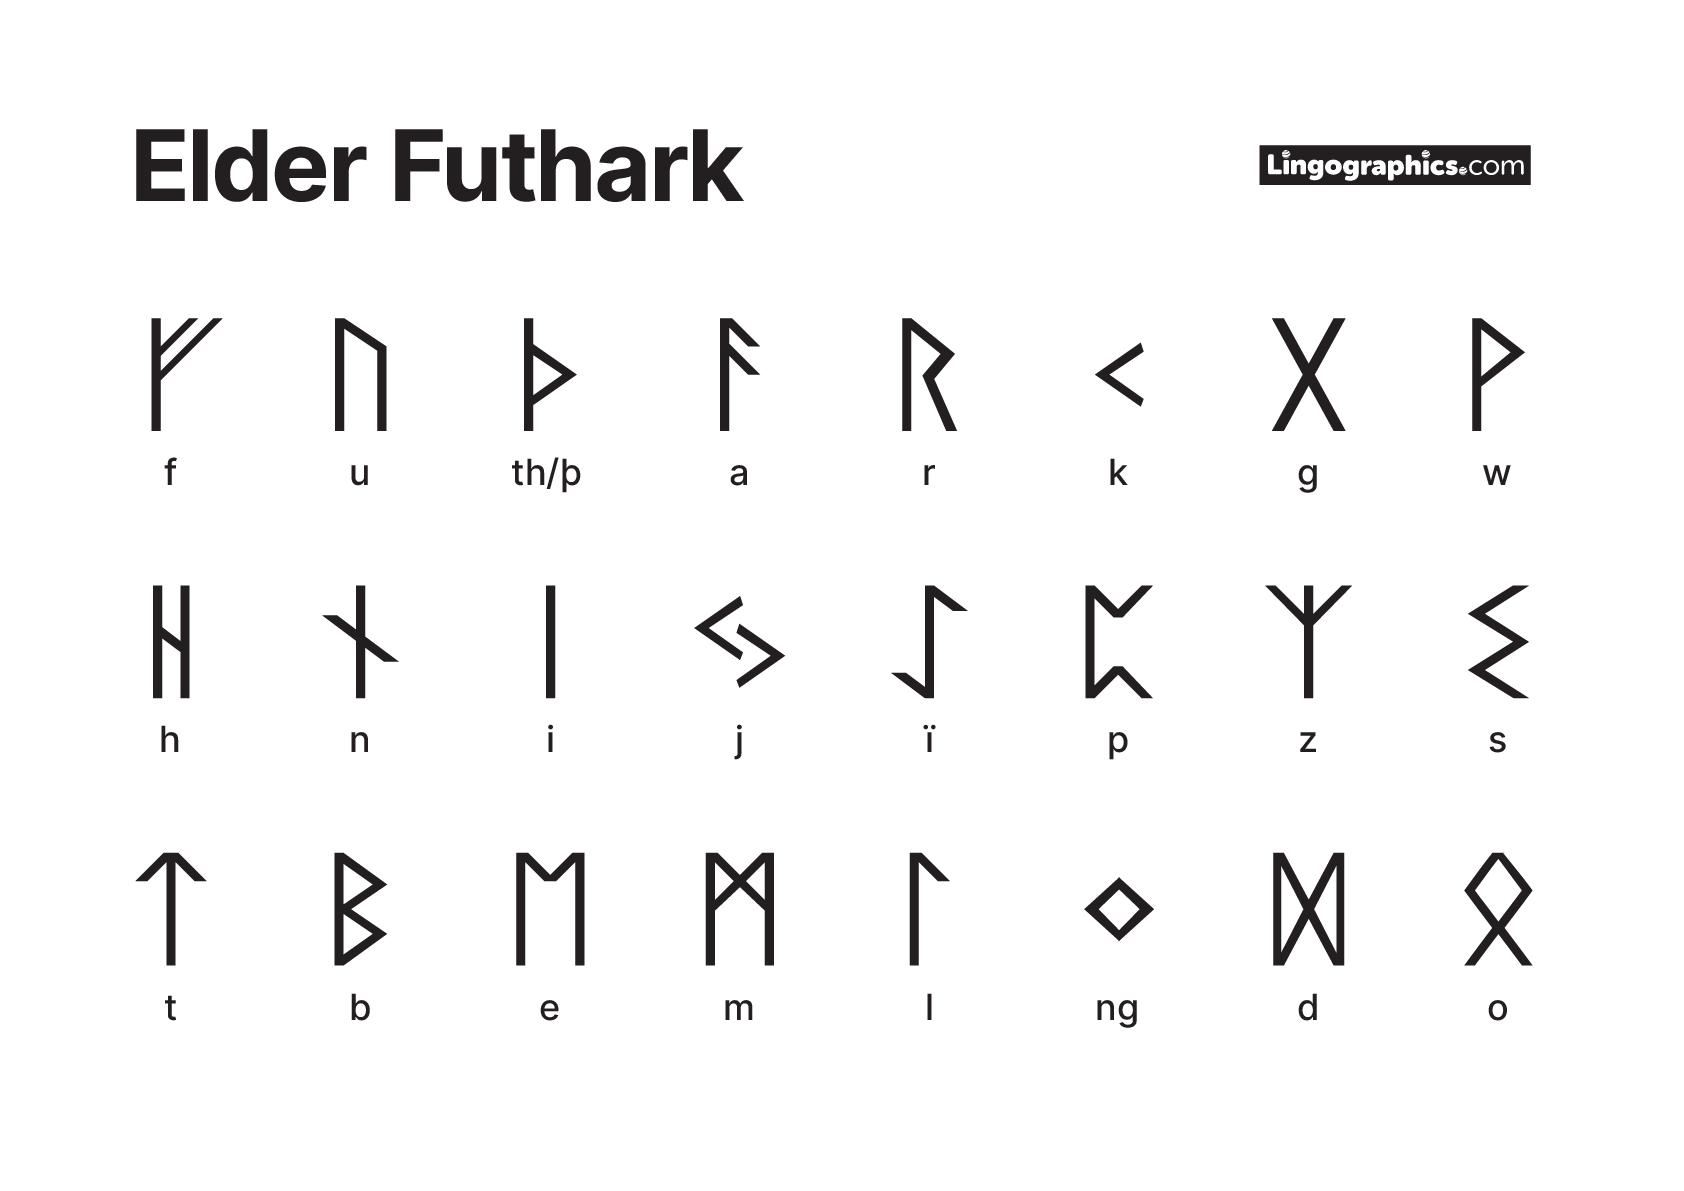 Elder Futhark printable